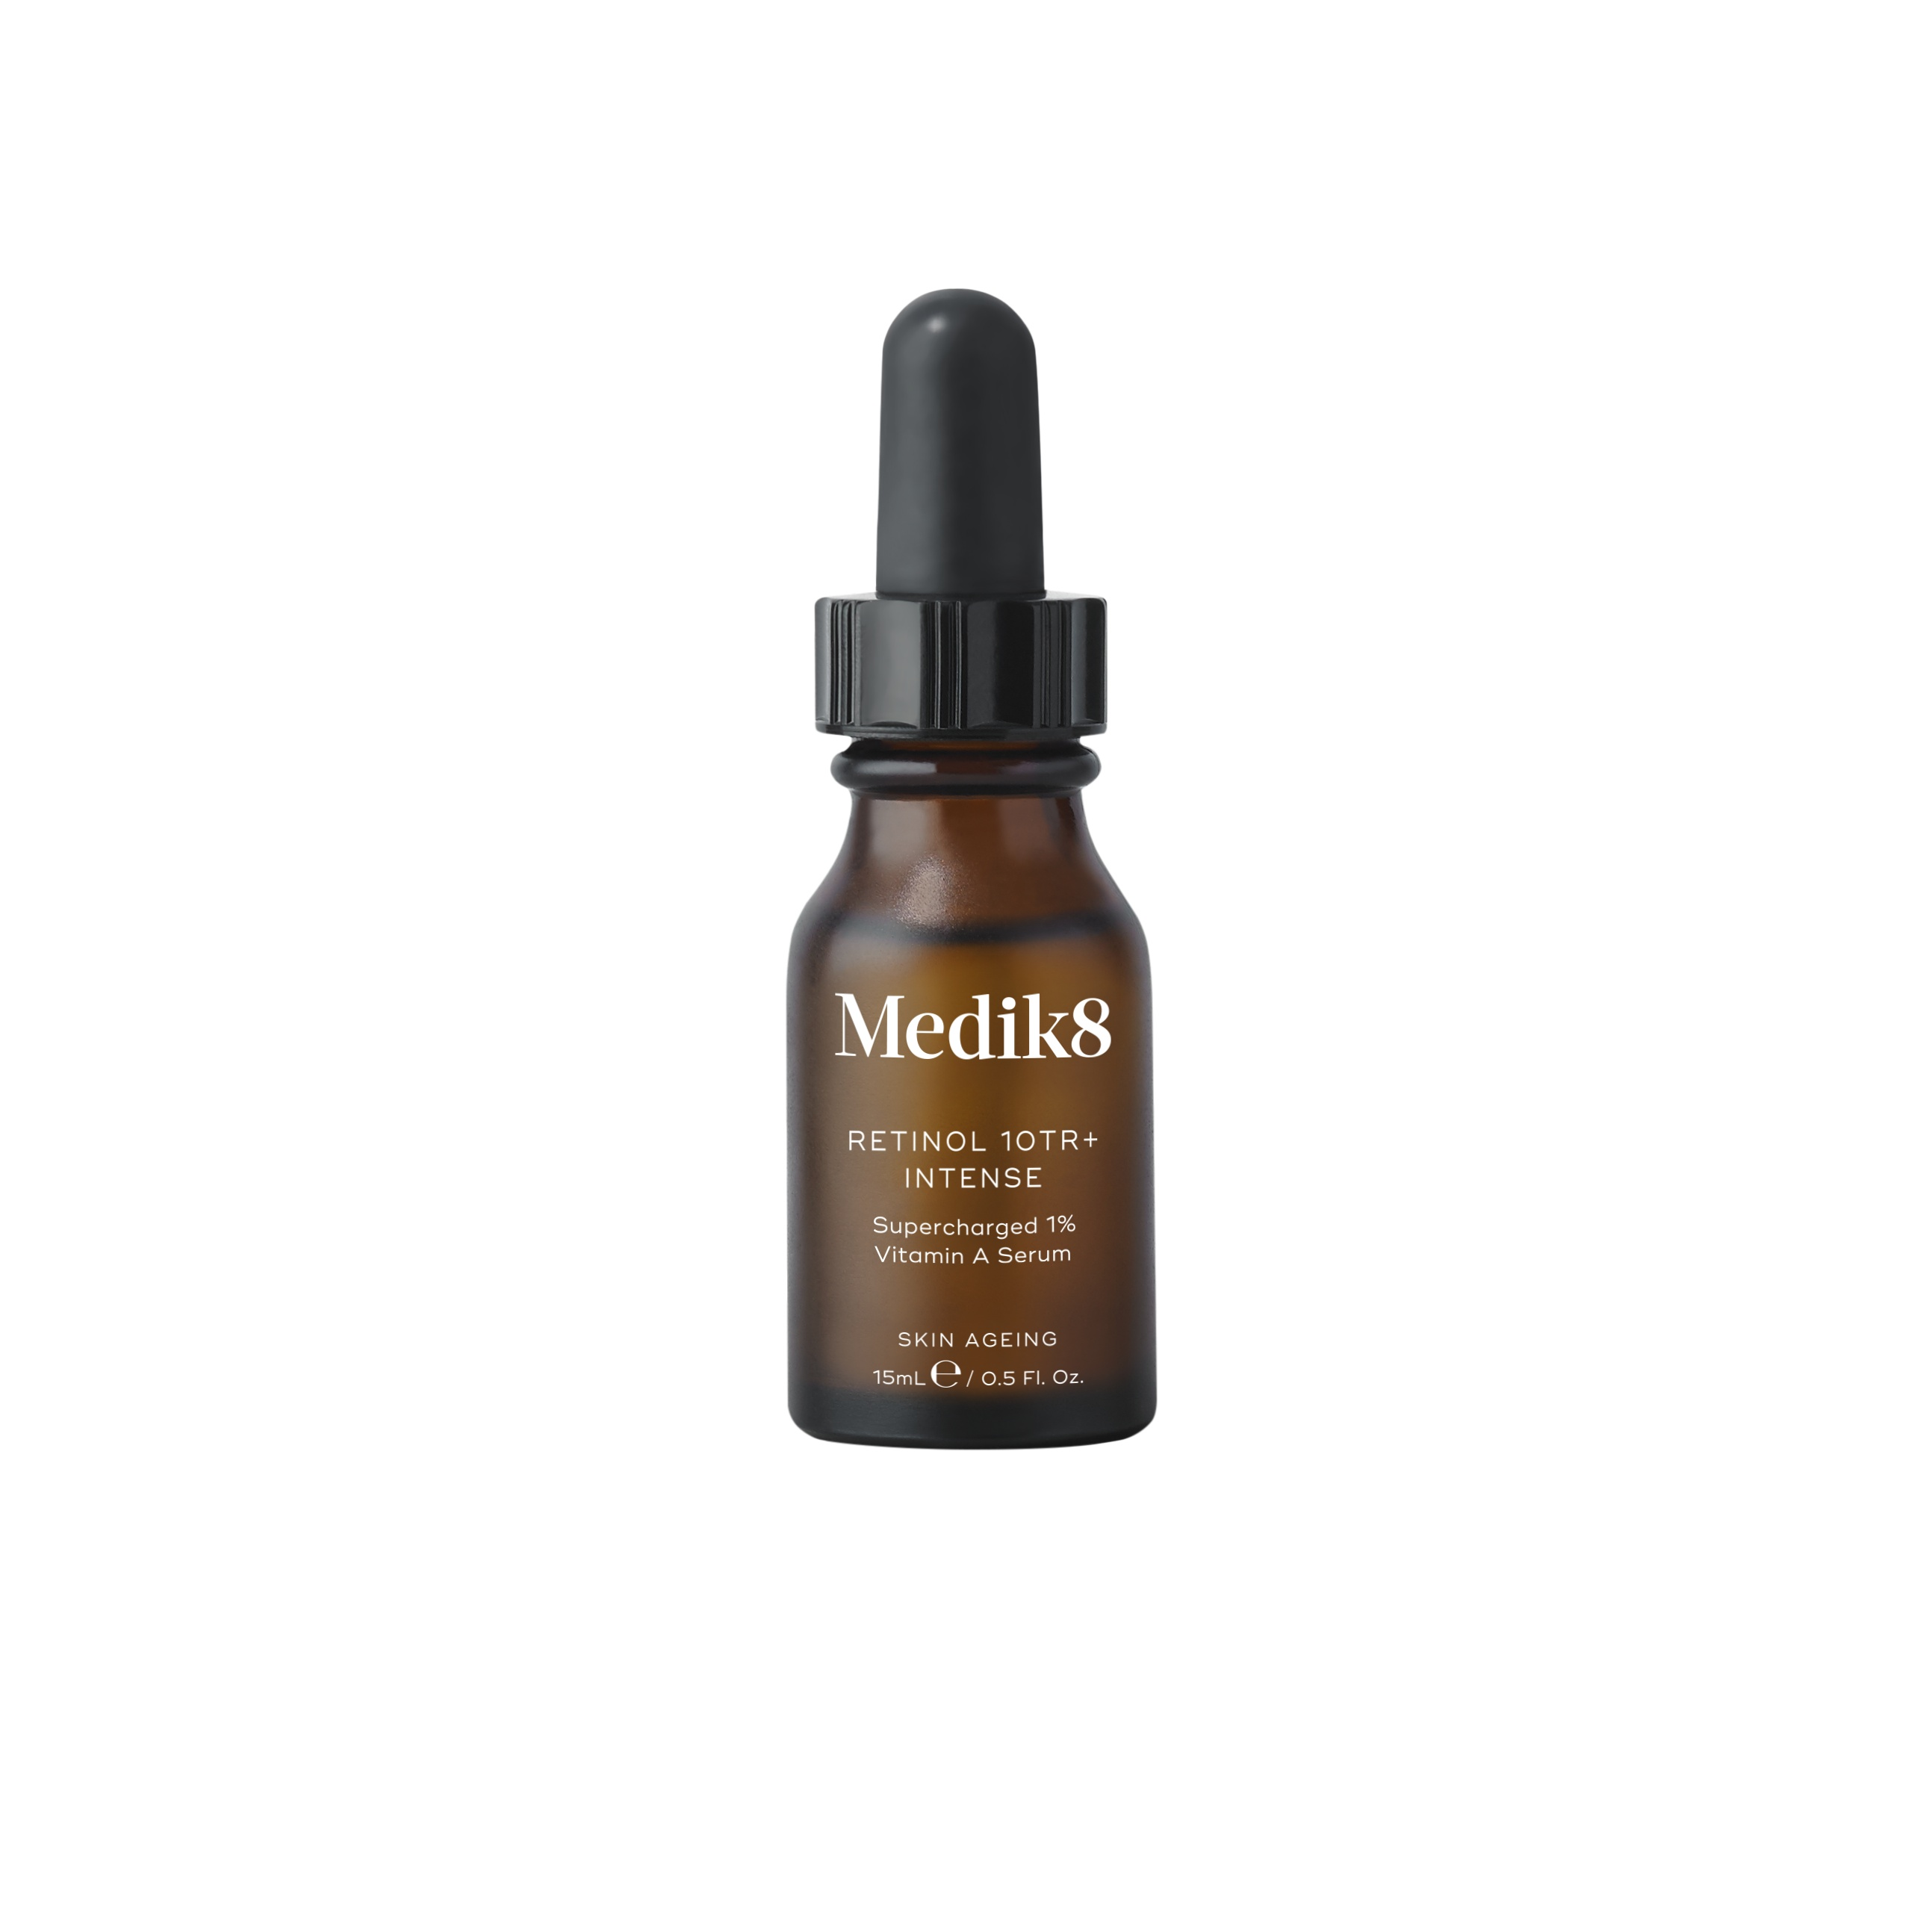 Medik8 Retinol 10TR+ Intense - noční vitaminové sérum